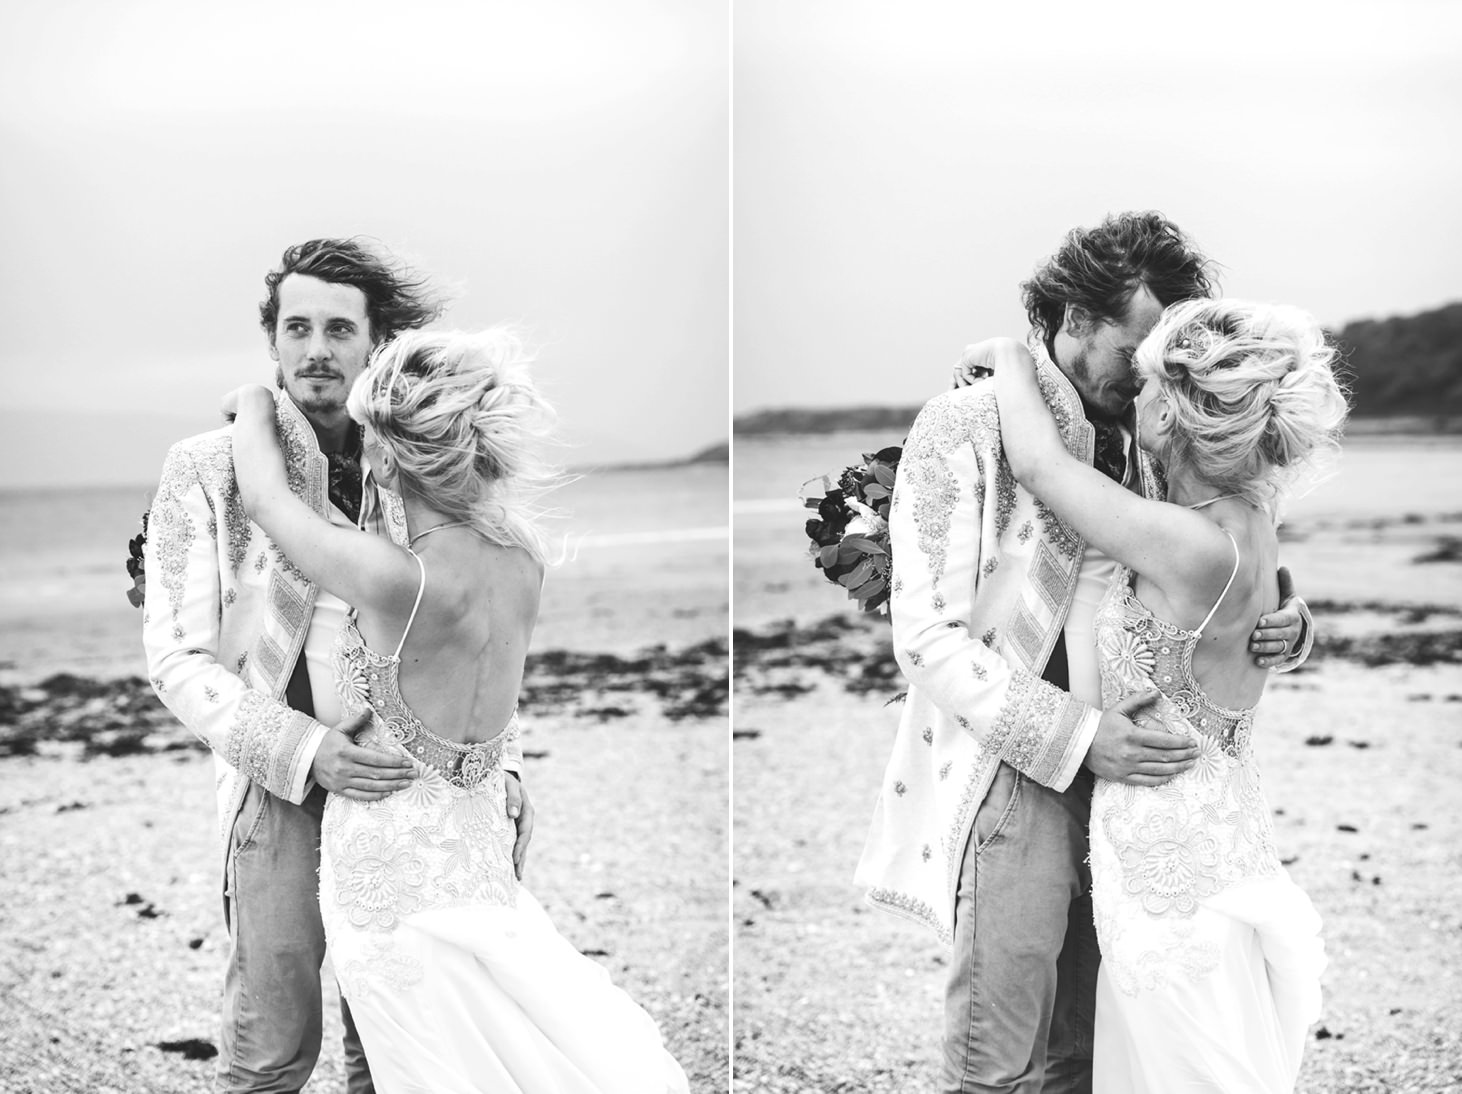 sle of bute wedding photography groom and bride hug